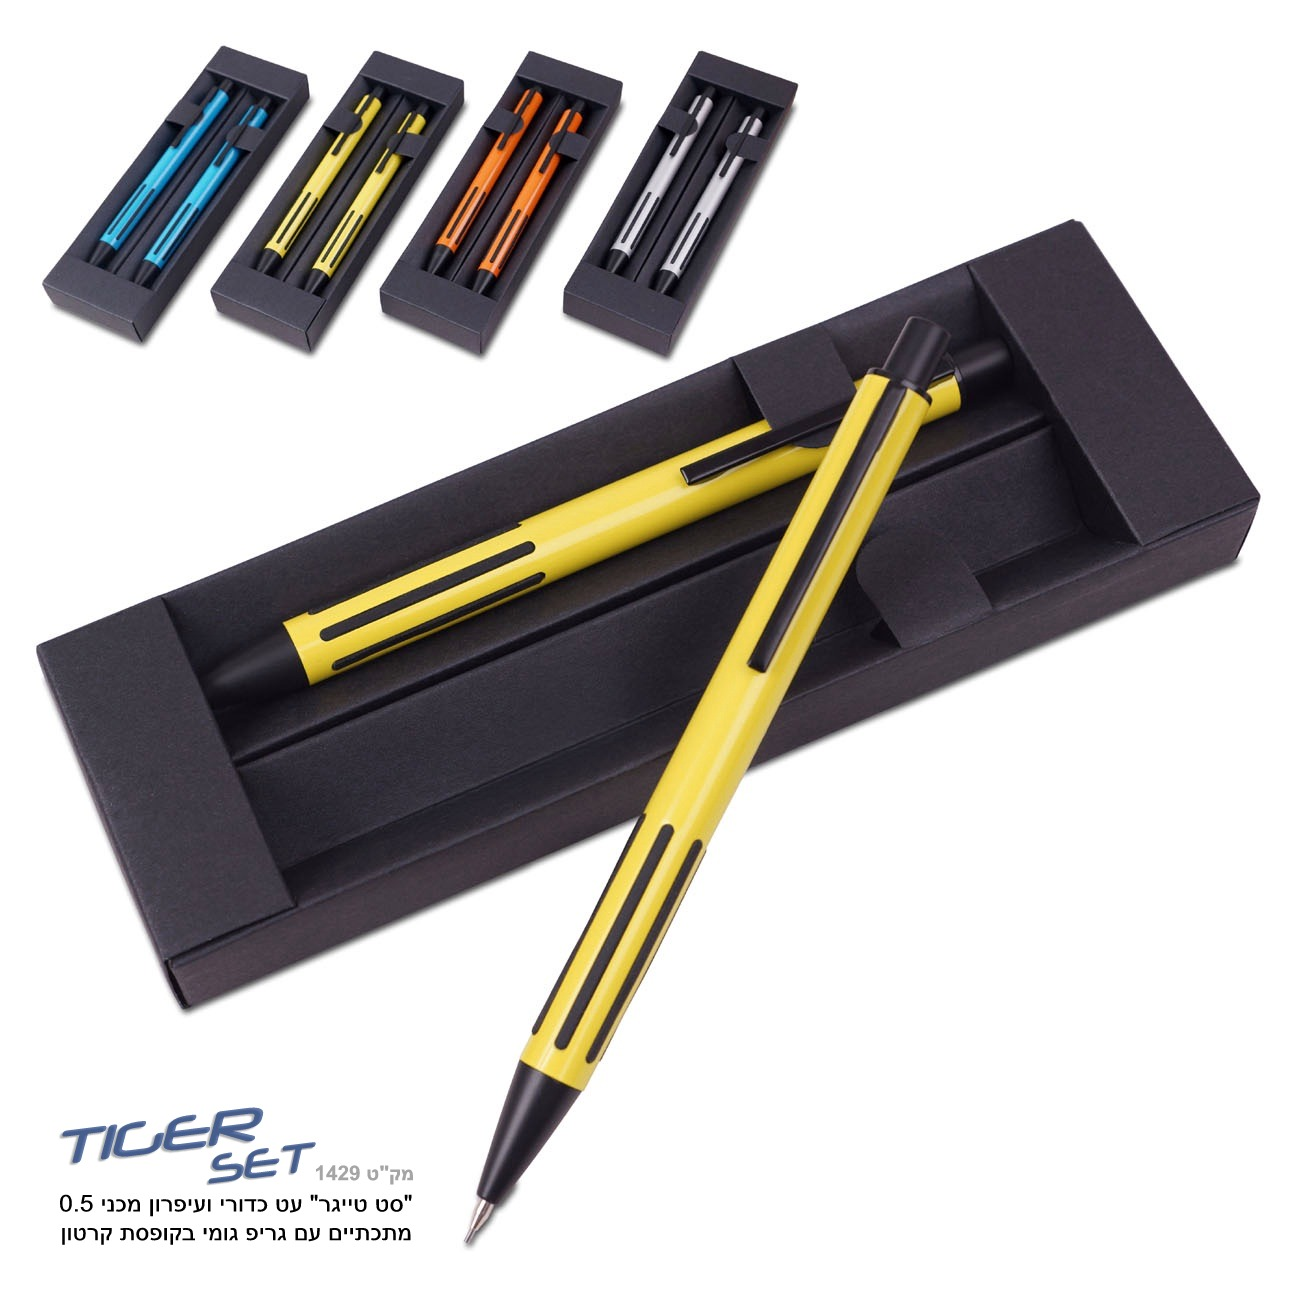 סט עטים | עט כדורי+עפרון מכני